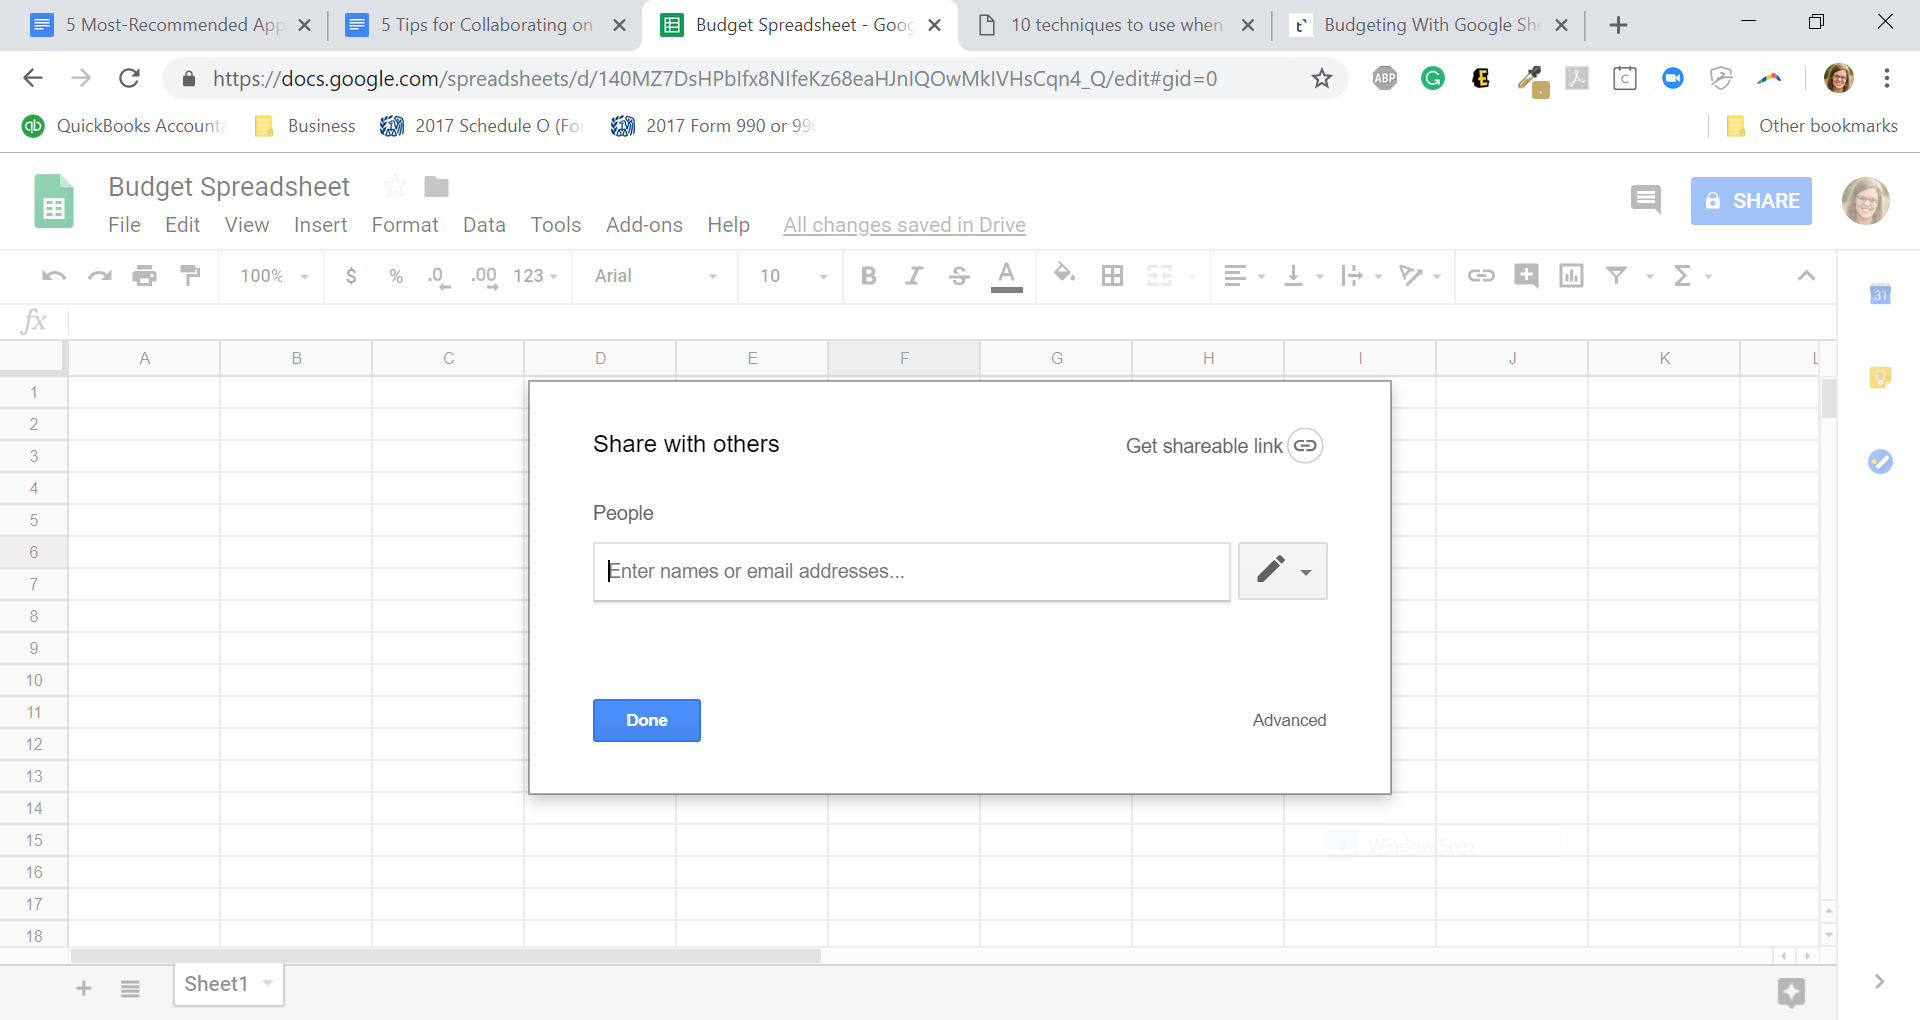 Share your Google Spreadsheet budget